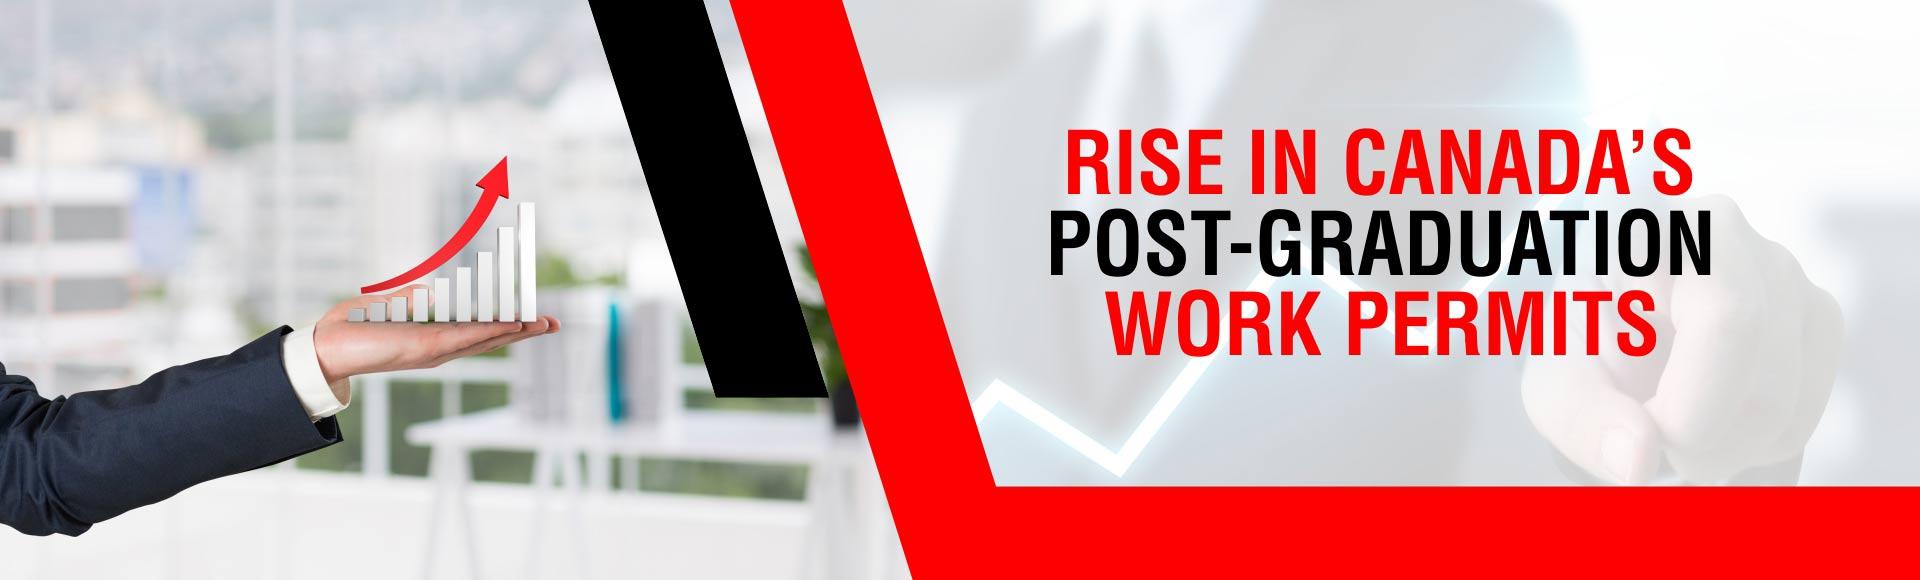 Rise in Canada's Post-Graduation Work Permits